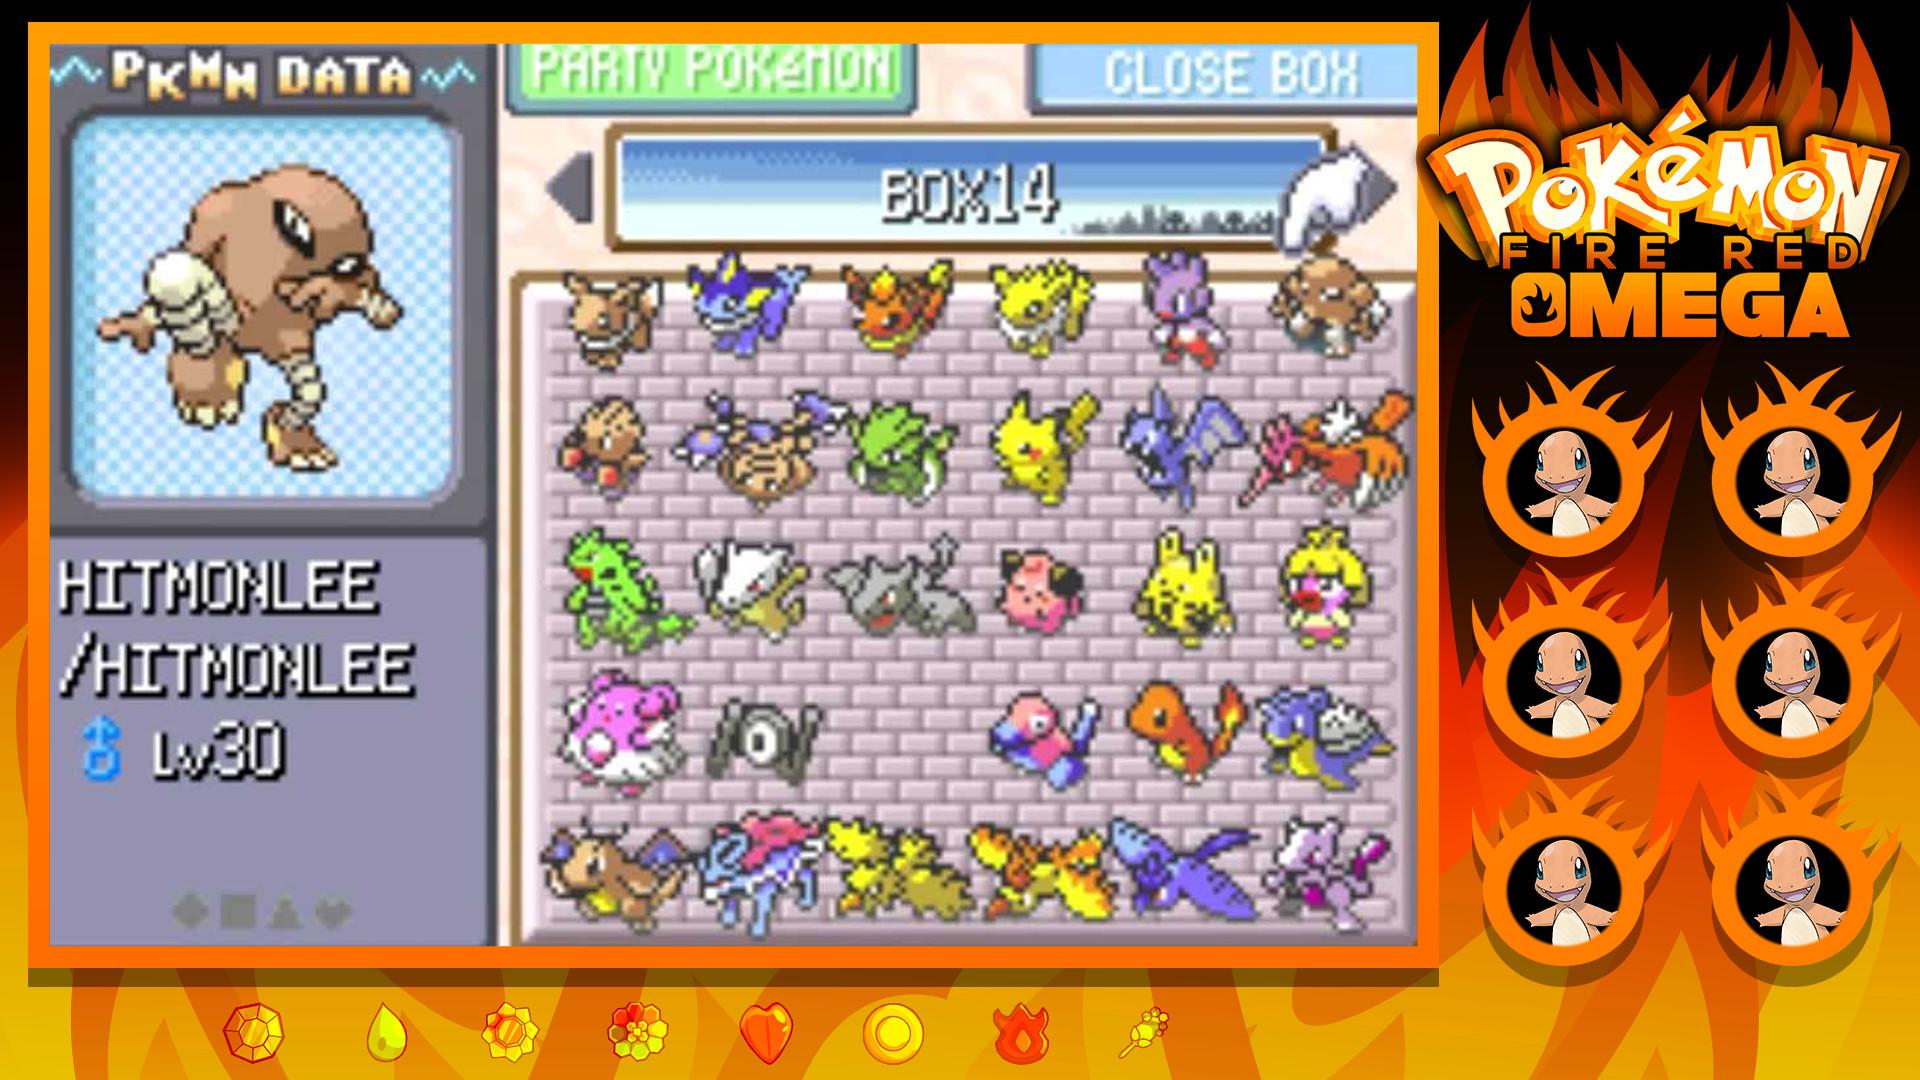 … Pokemon Fire Red OMEGA Nuzlocke by TheShidori